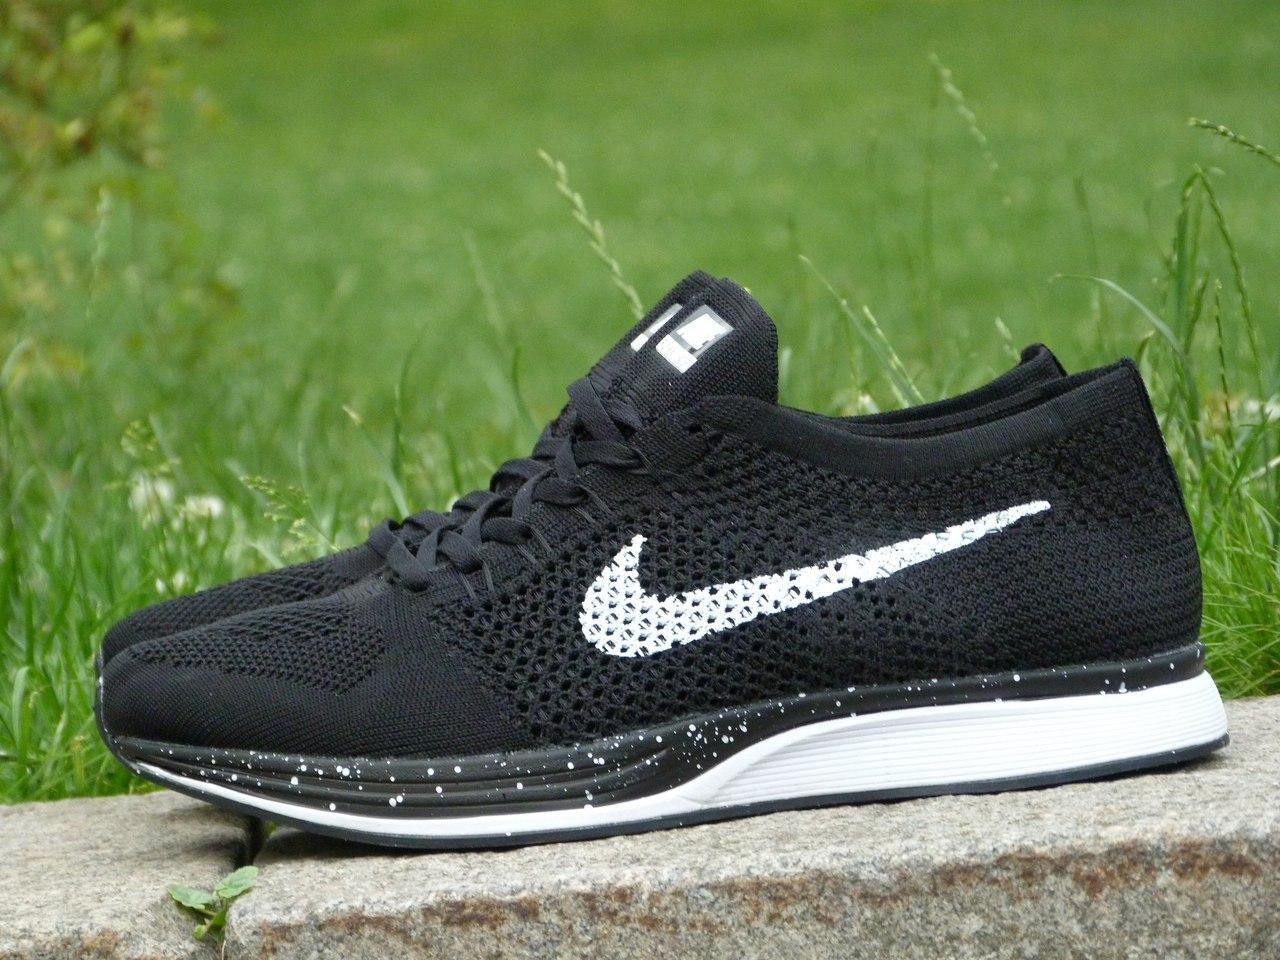 965f58db7457 Кроссовки мужские для бега Nike Flyknit Racer (найк аир макс) (реплика) -